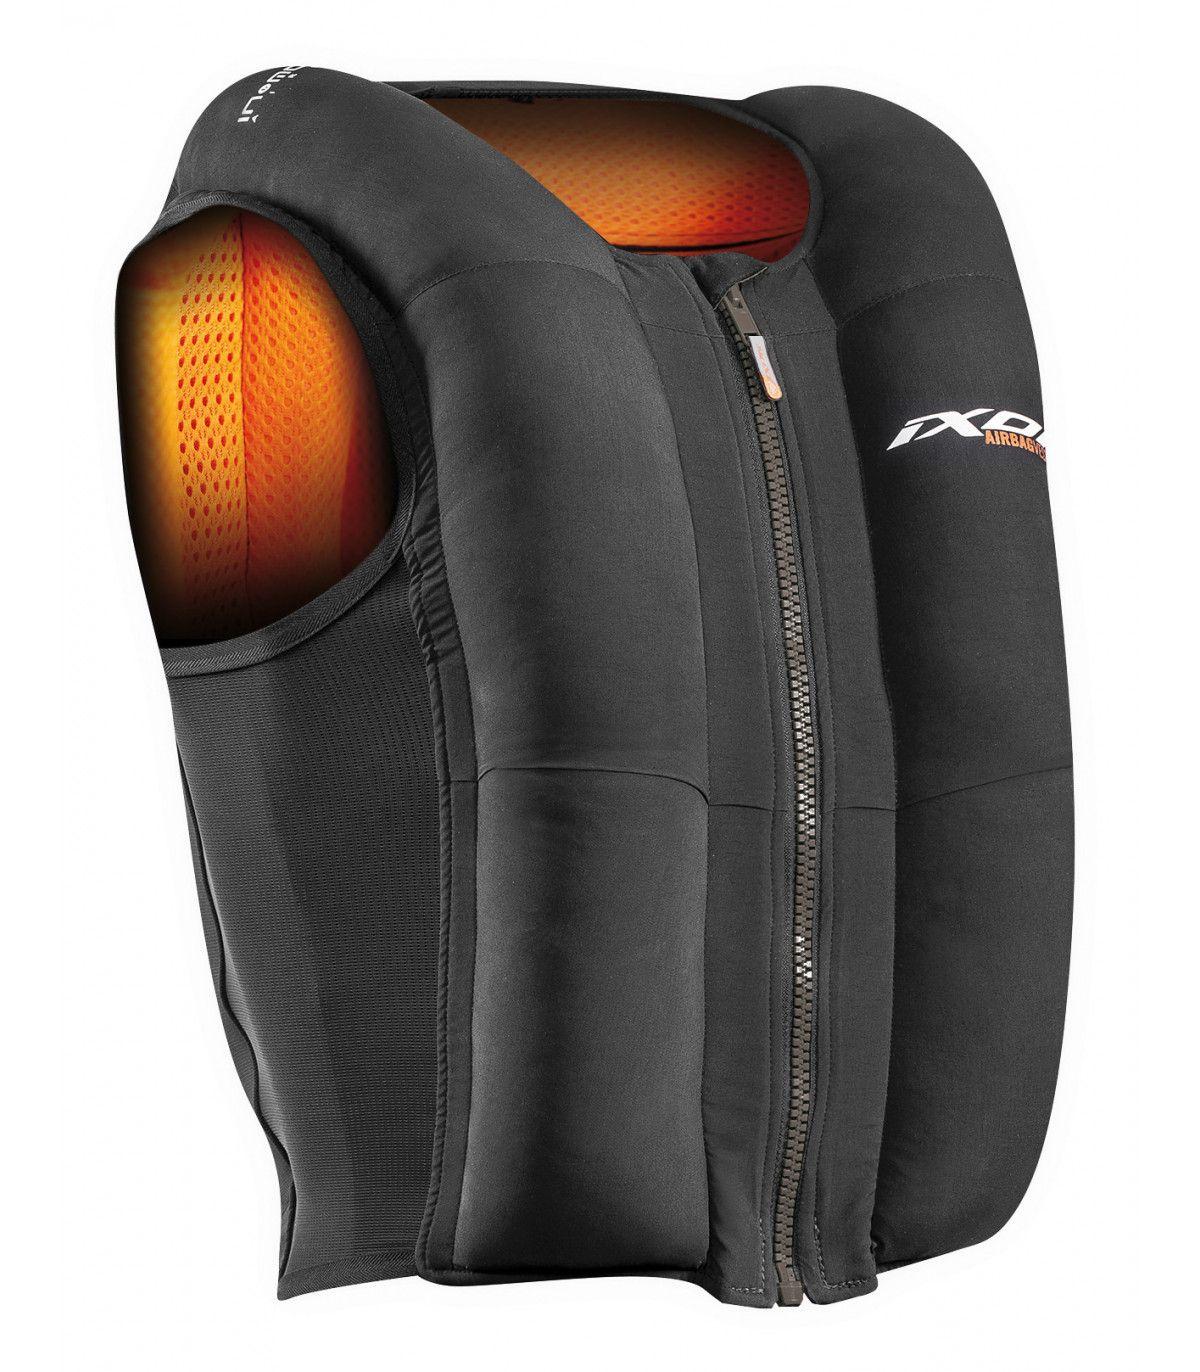 Gilet airbag pour motard Ixon IX-Airbag U03 - Noir/orange, Tailles XS à XL (motardpascher.com)